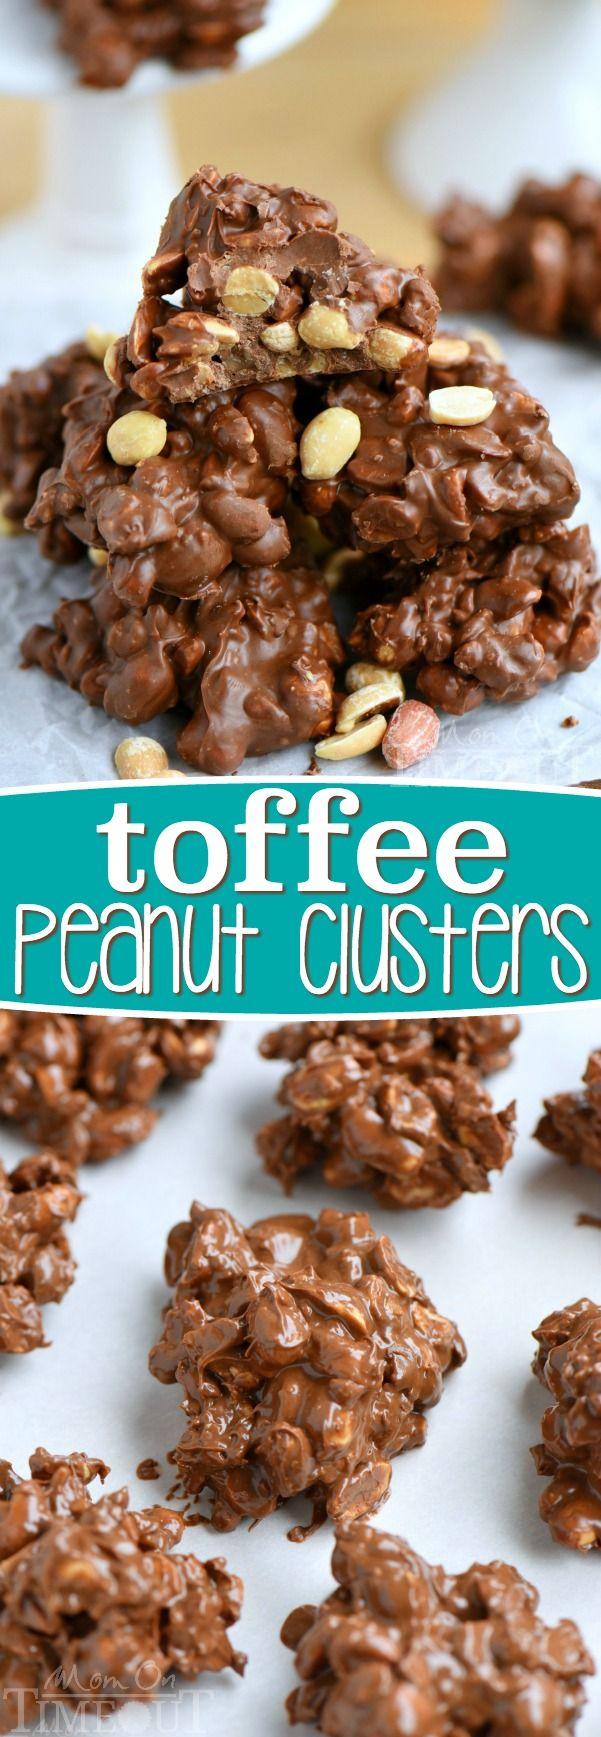 Toffee Peanut Clusters Recipe - a crunchy treat!